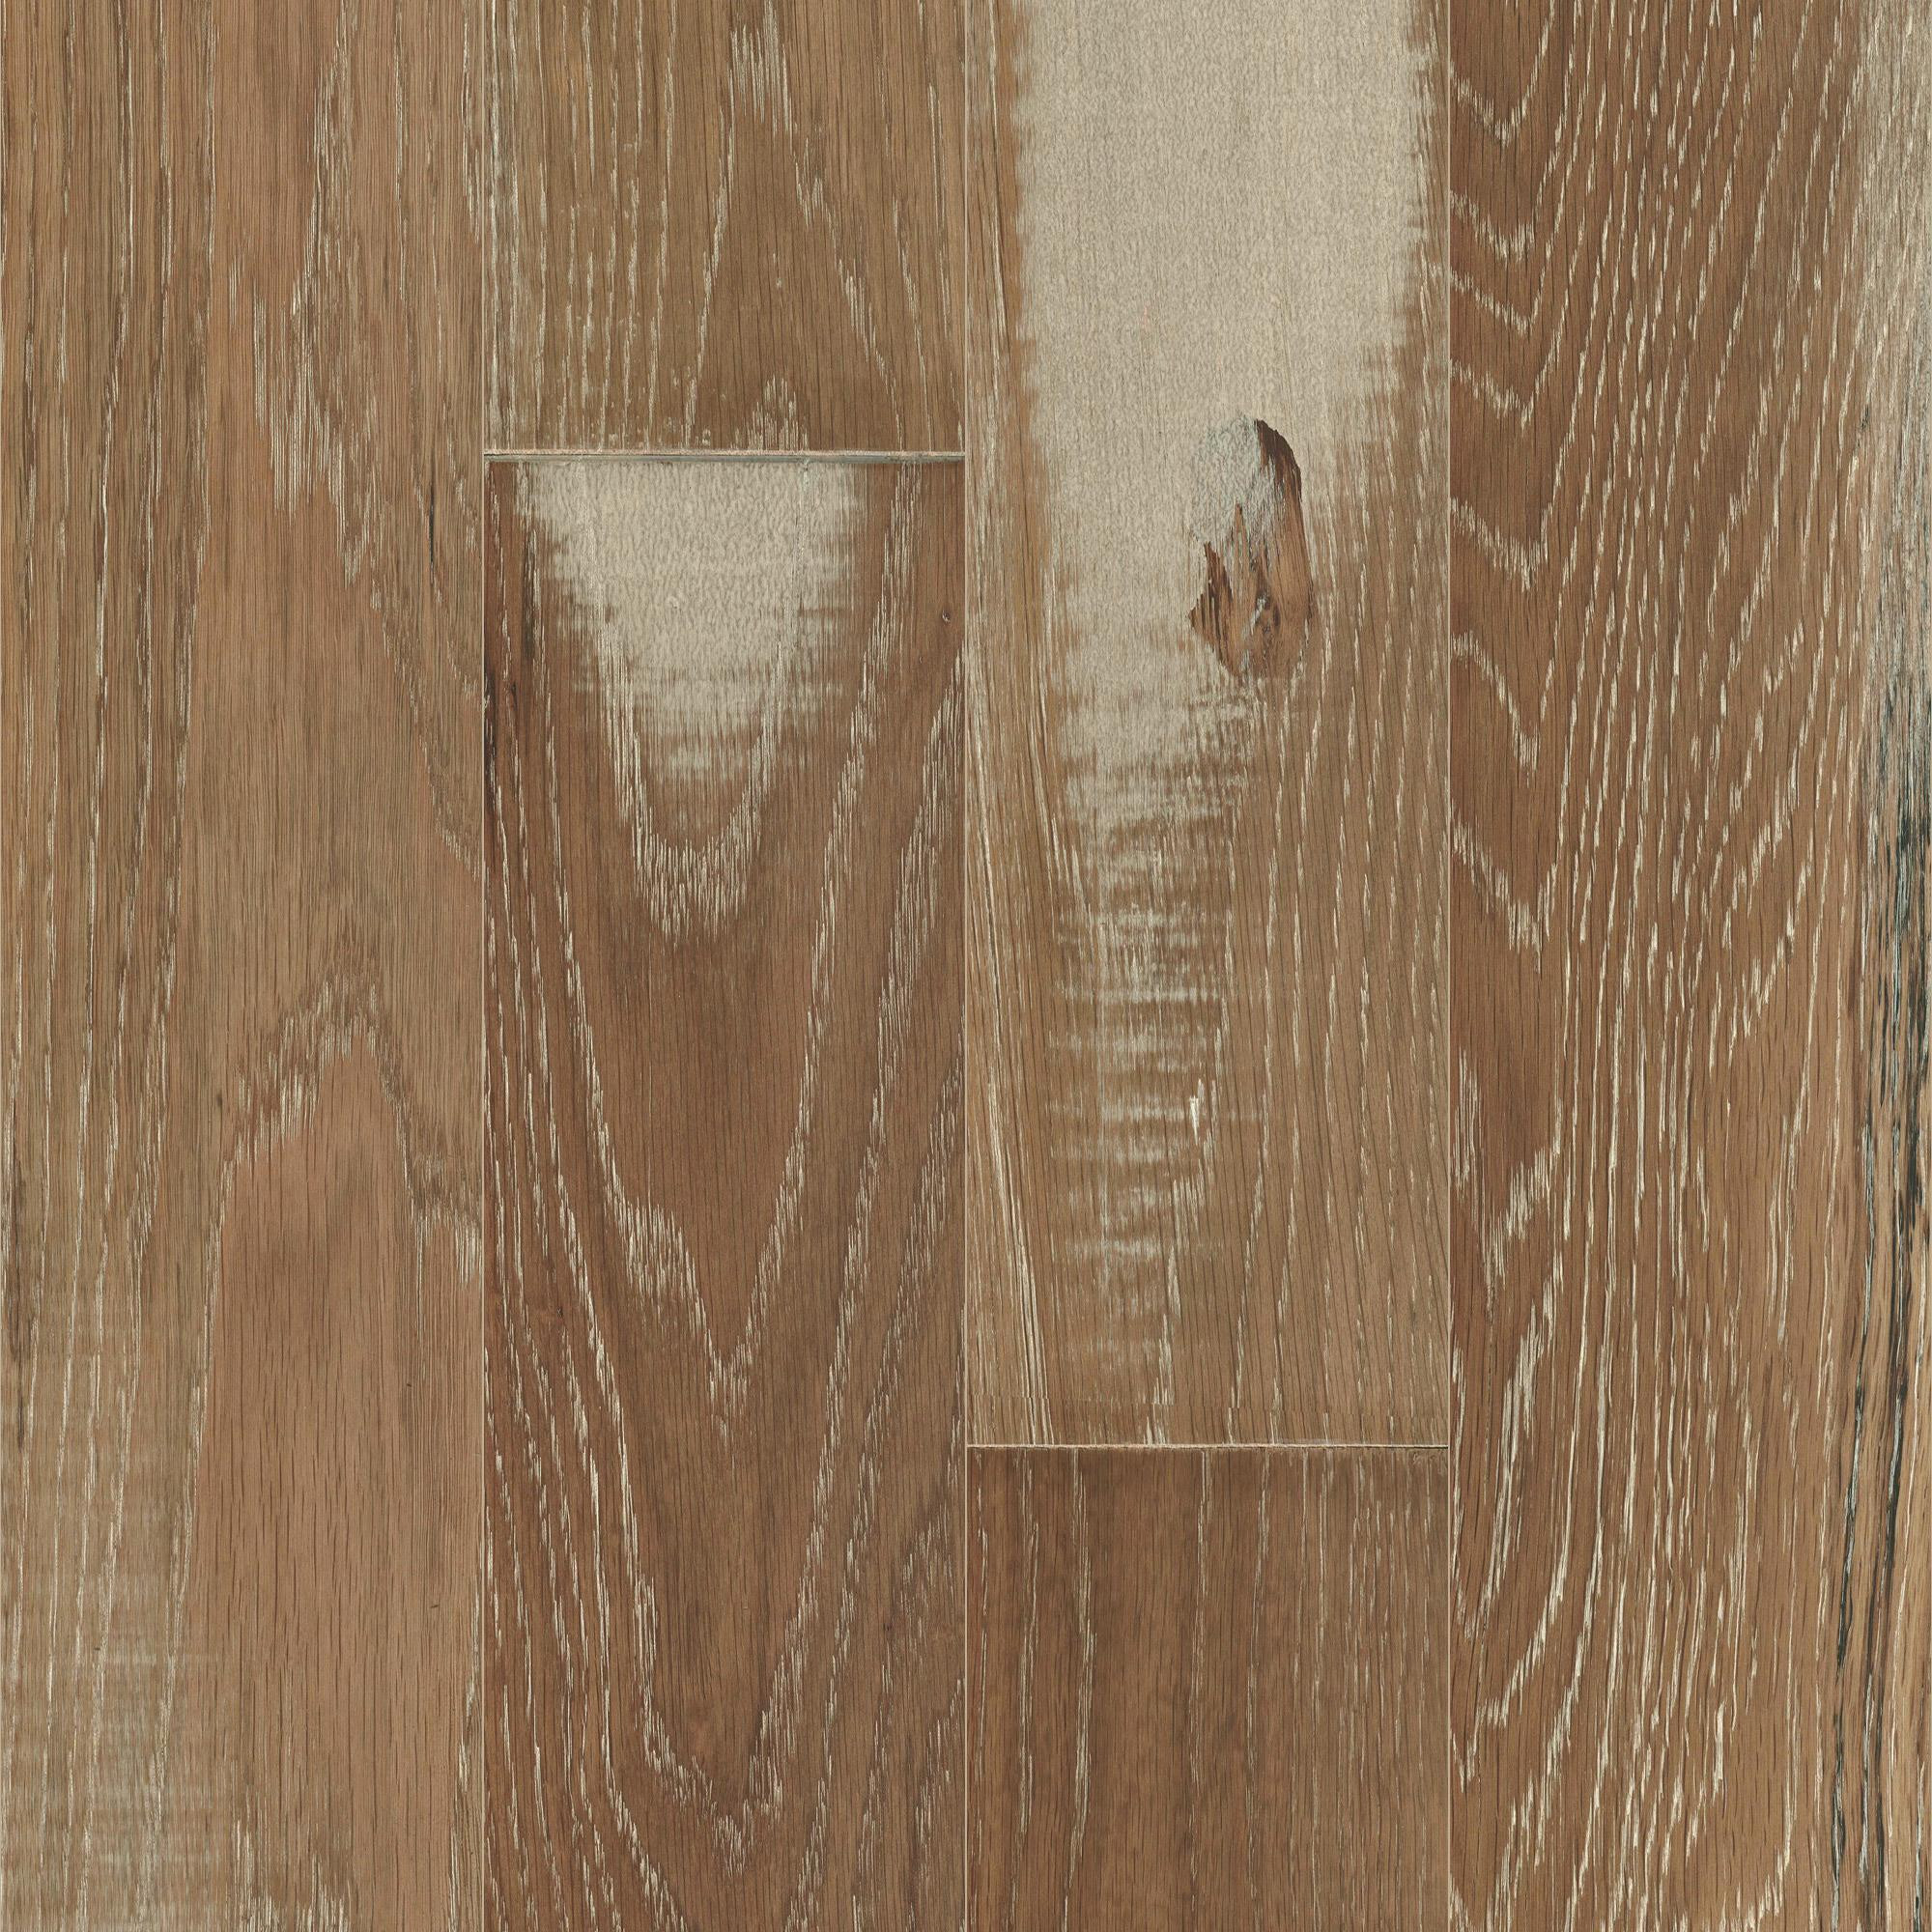 5 red oak hardwood flooring of mullican castillian oak latte 5 wide solid hardwood flooring inside file 447 8